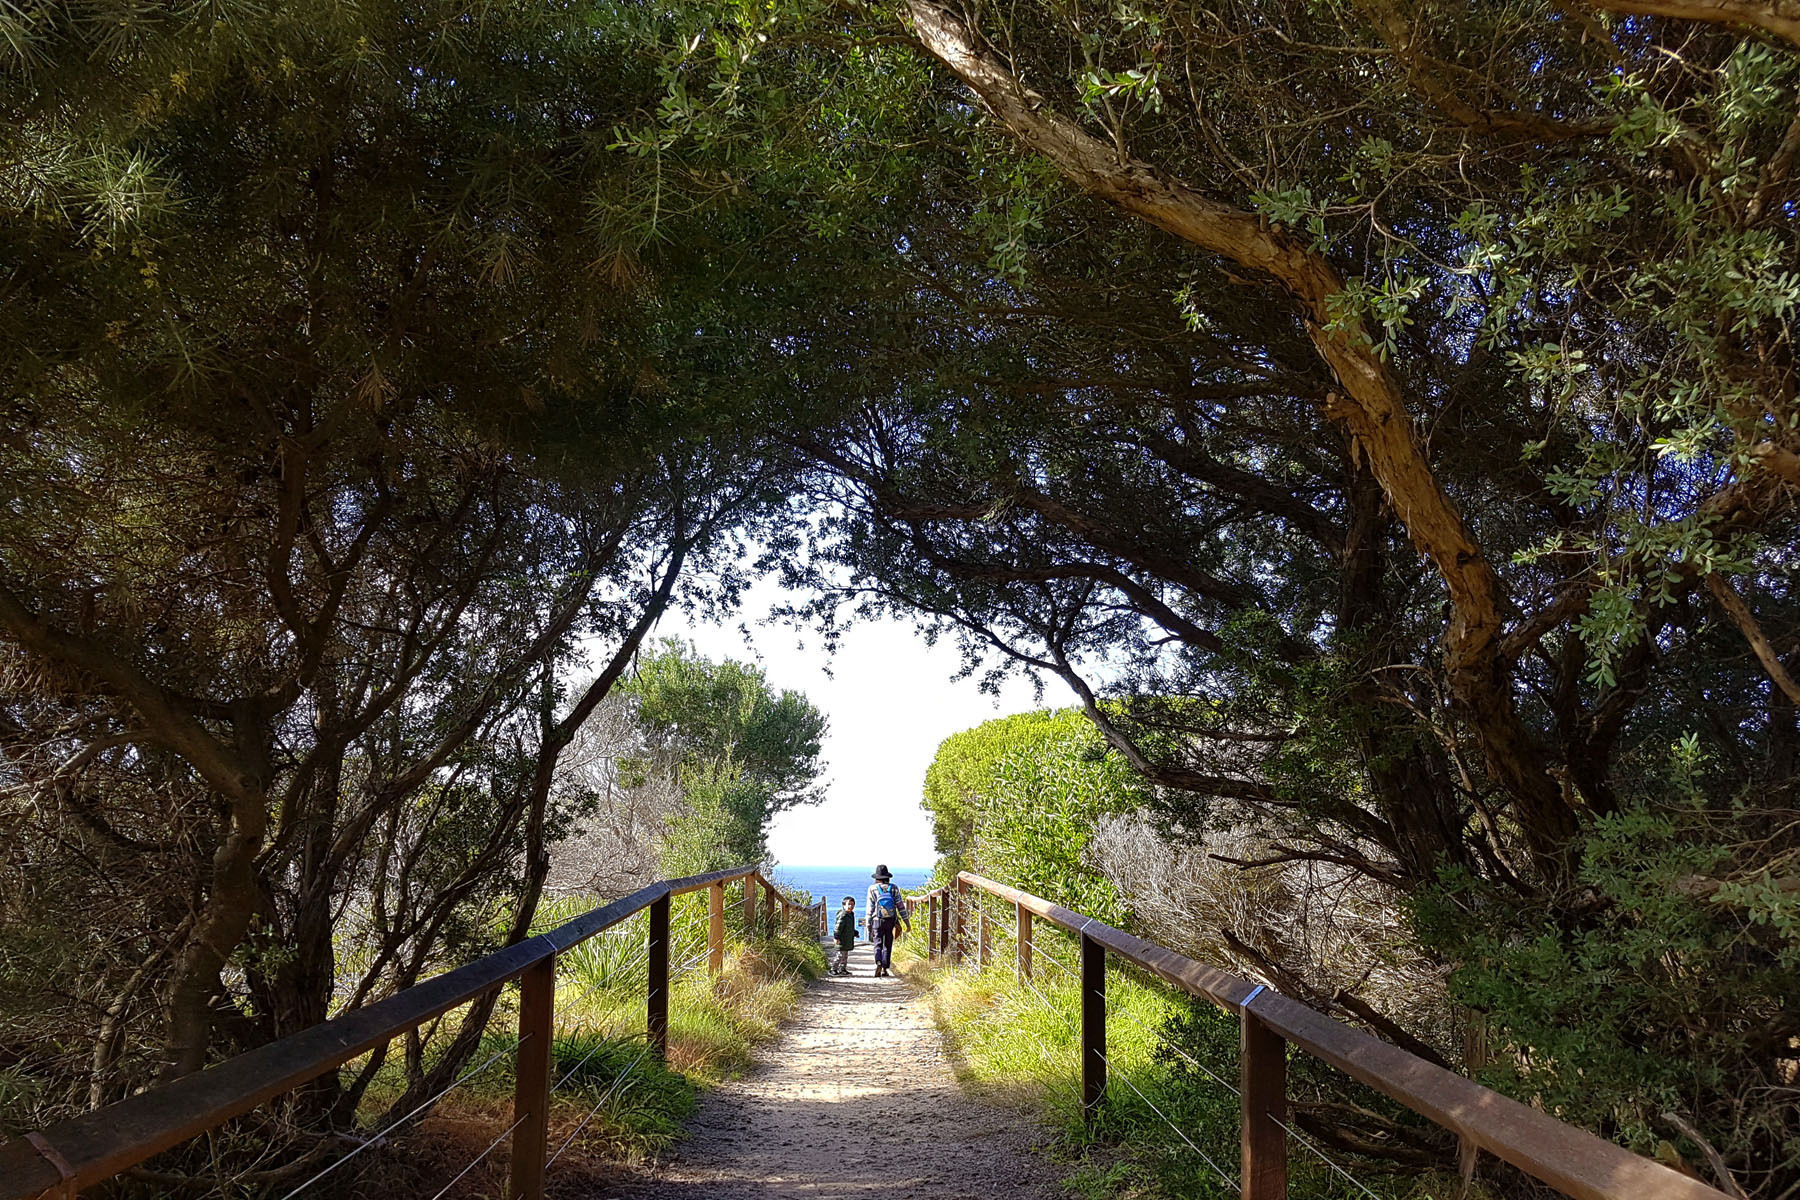 SGMT Australia Sydney_Bondi to Coogee Coastal Walk_08 Leafy tunnel